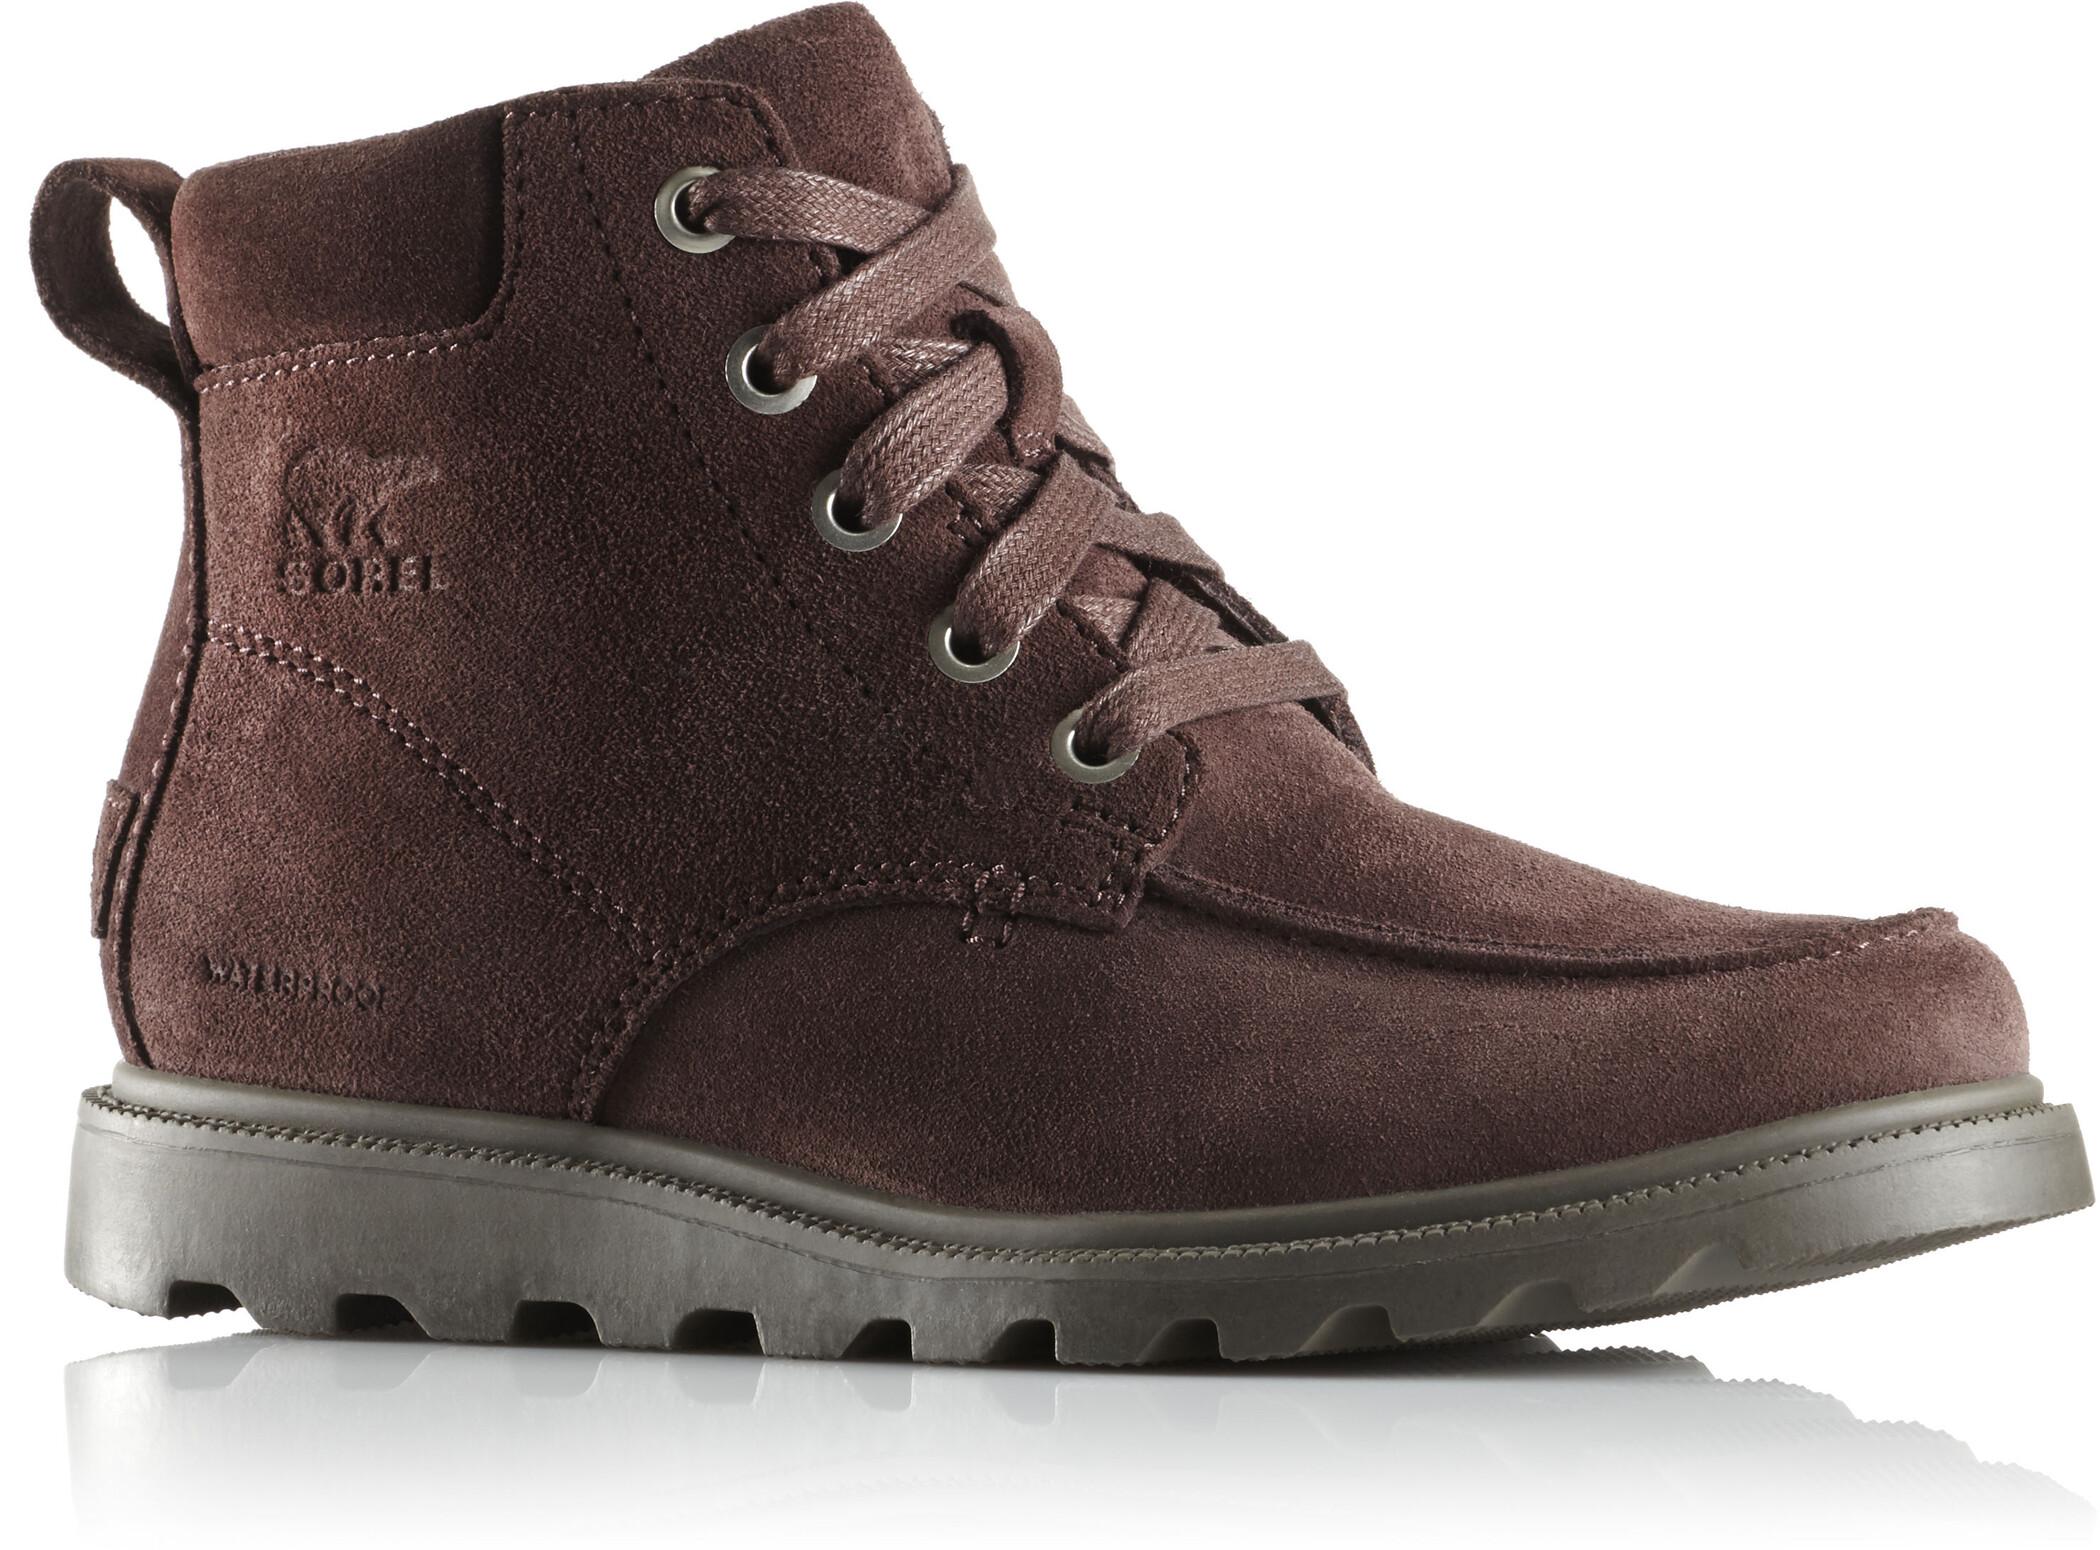 Sorel Madson Moc Toe Waterproof Shoes Barn blackblack